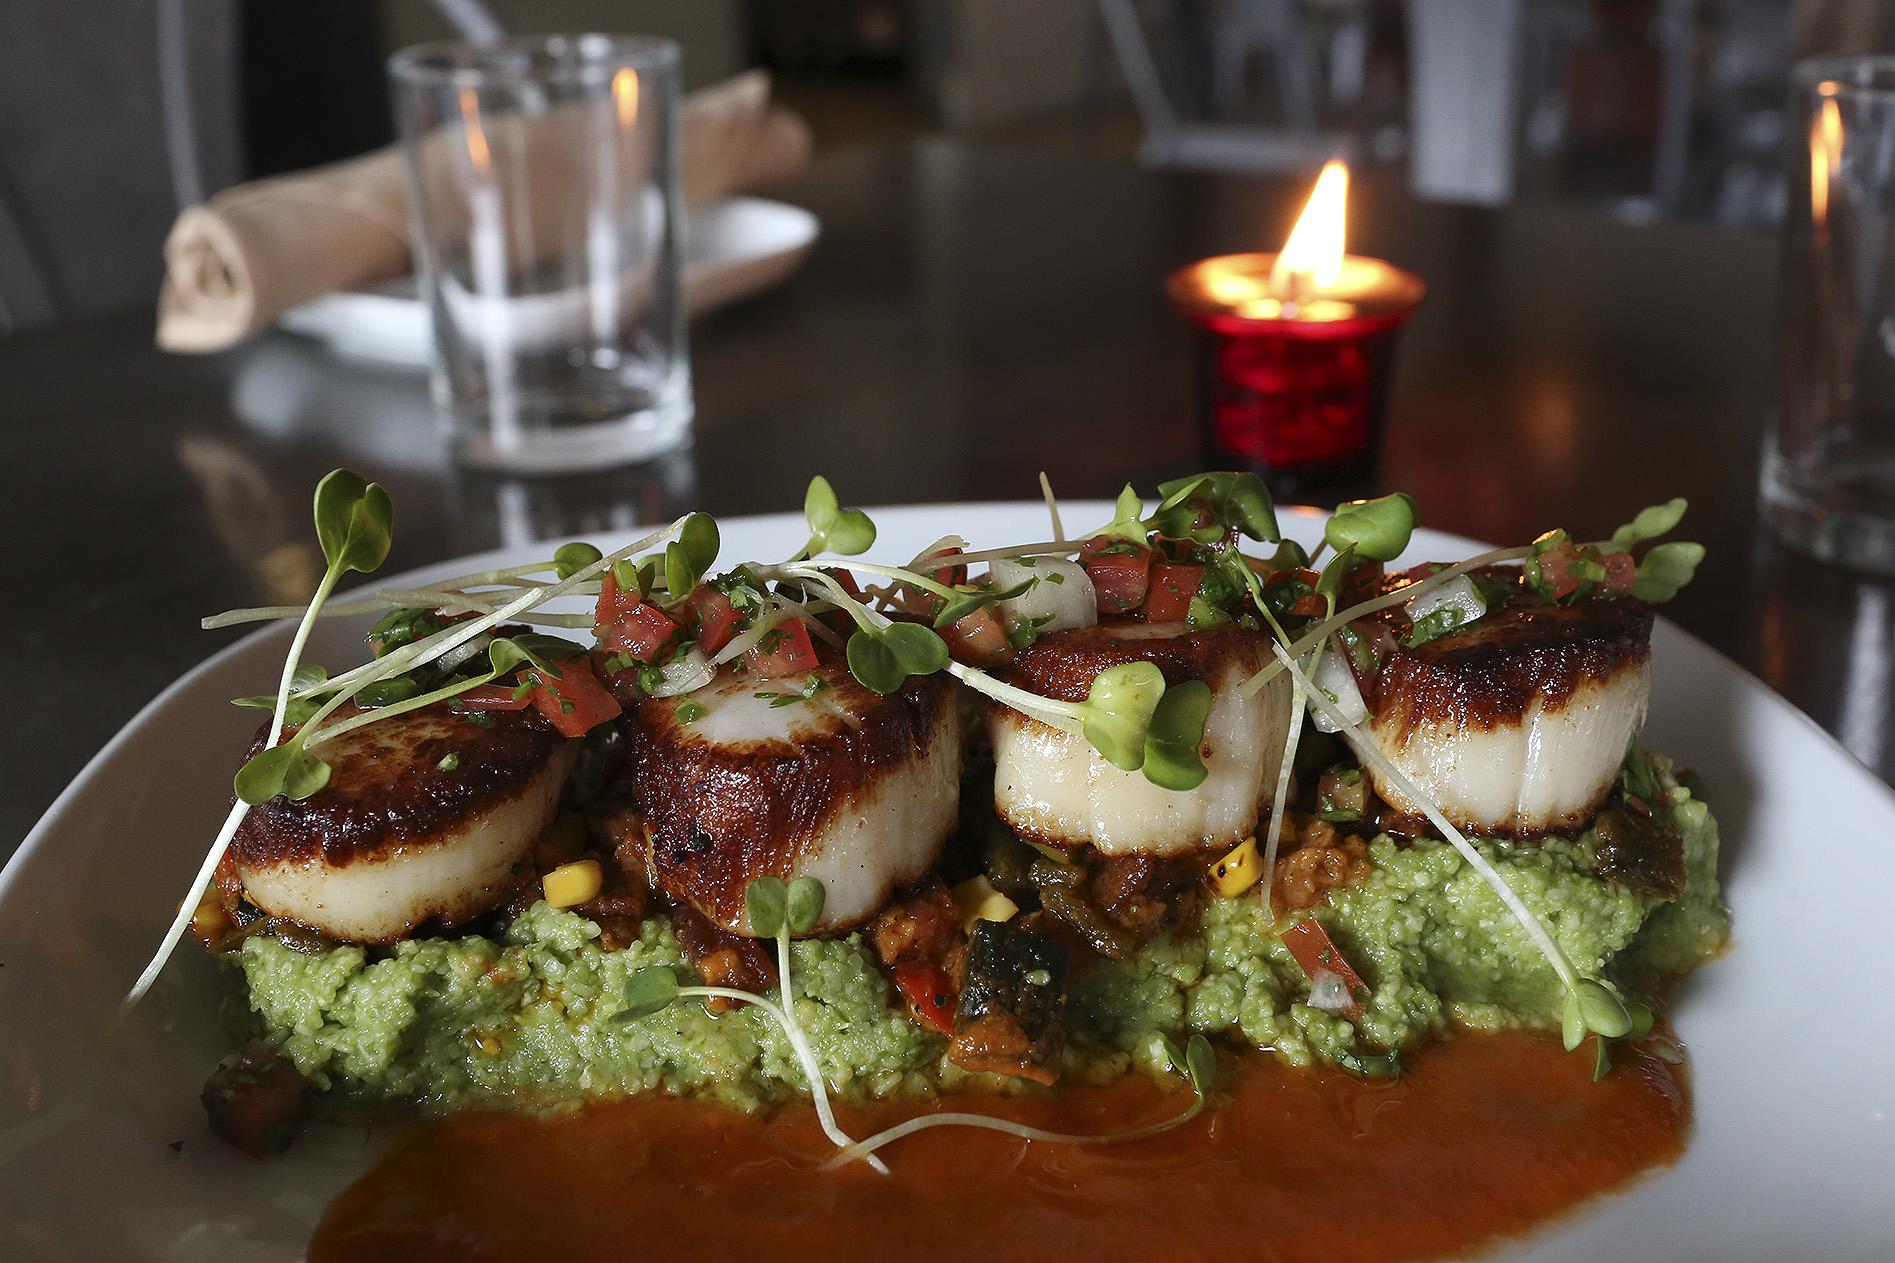 New Year restaurant specials to celebrate in San Antonio - San ...